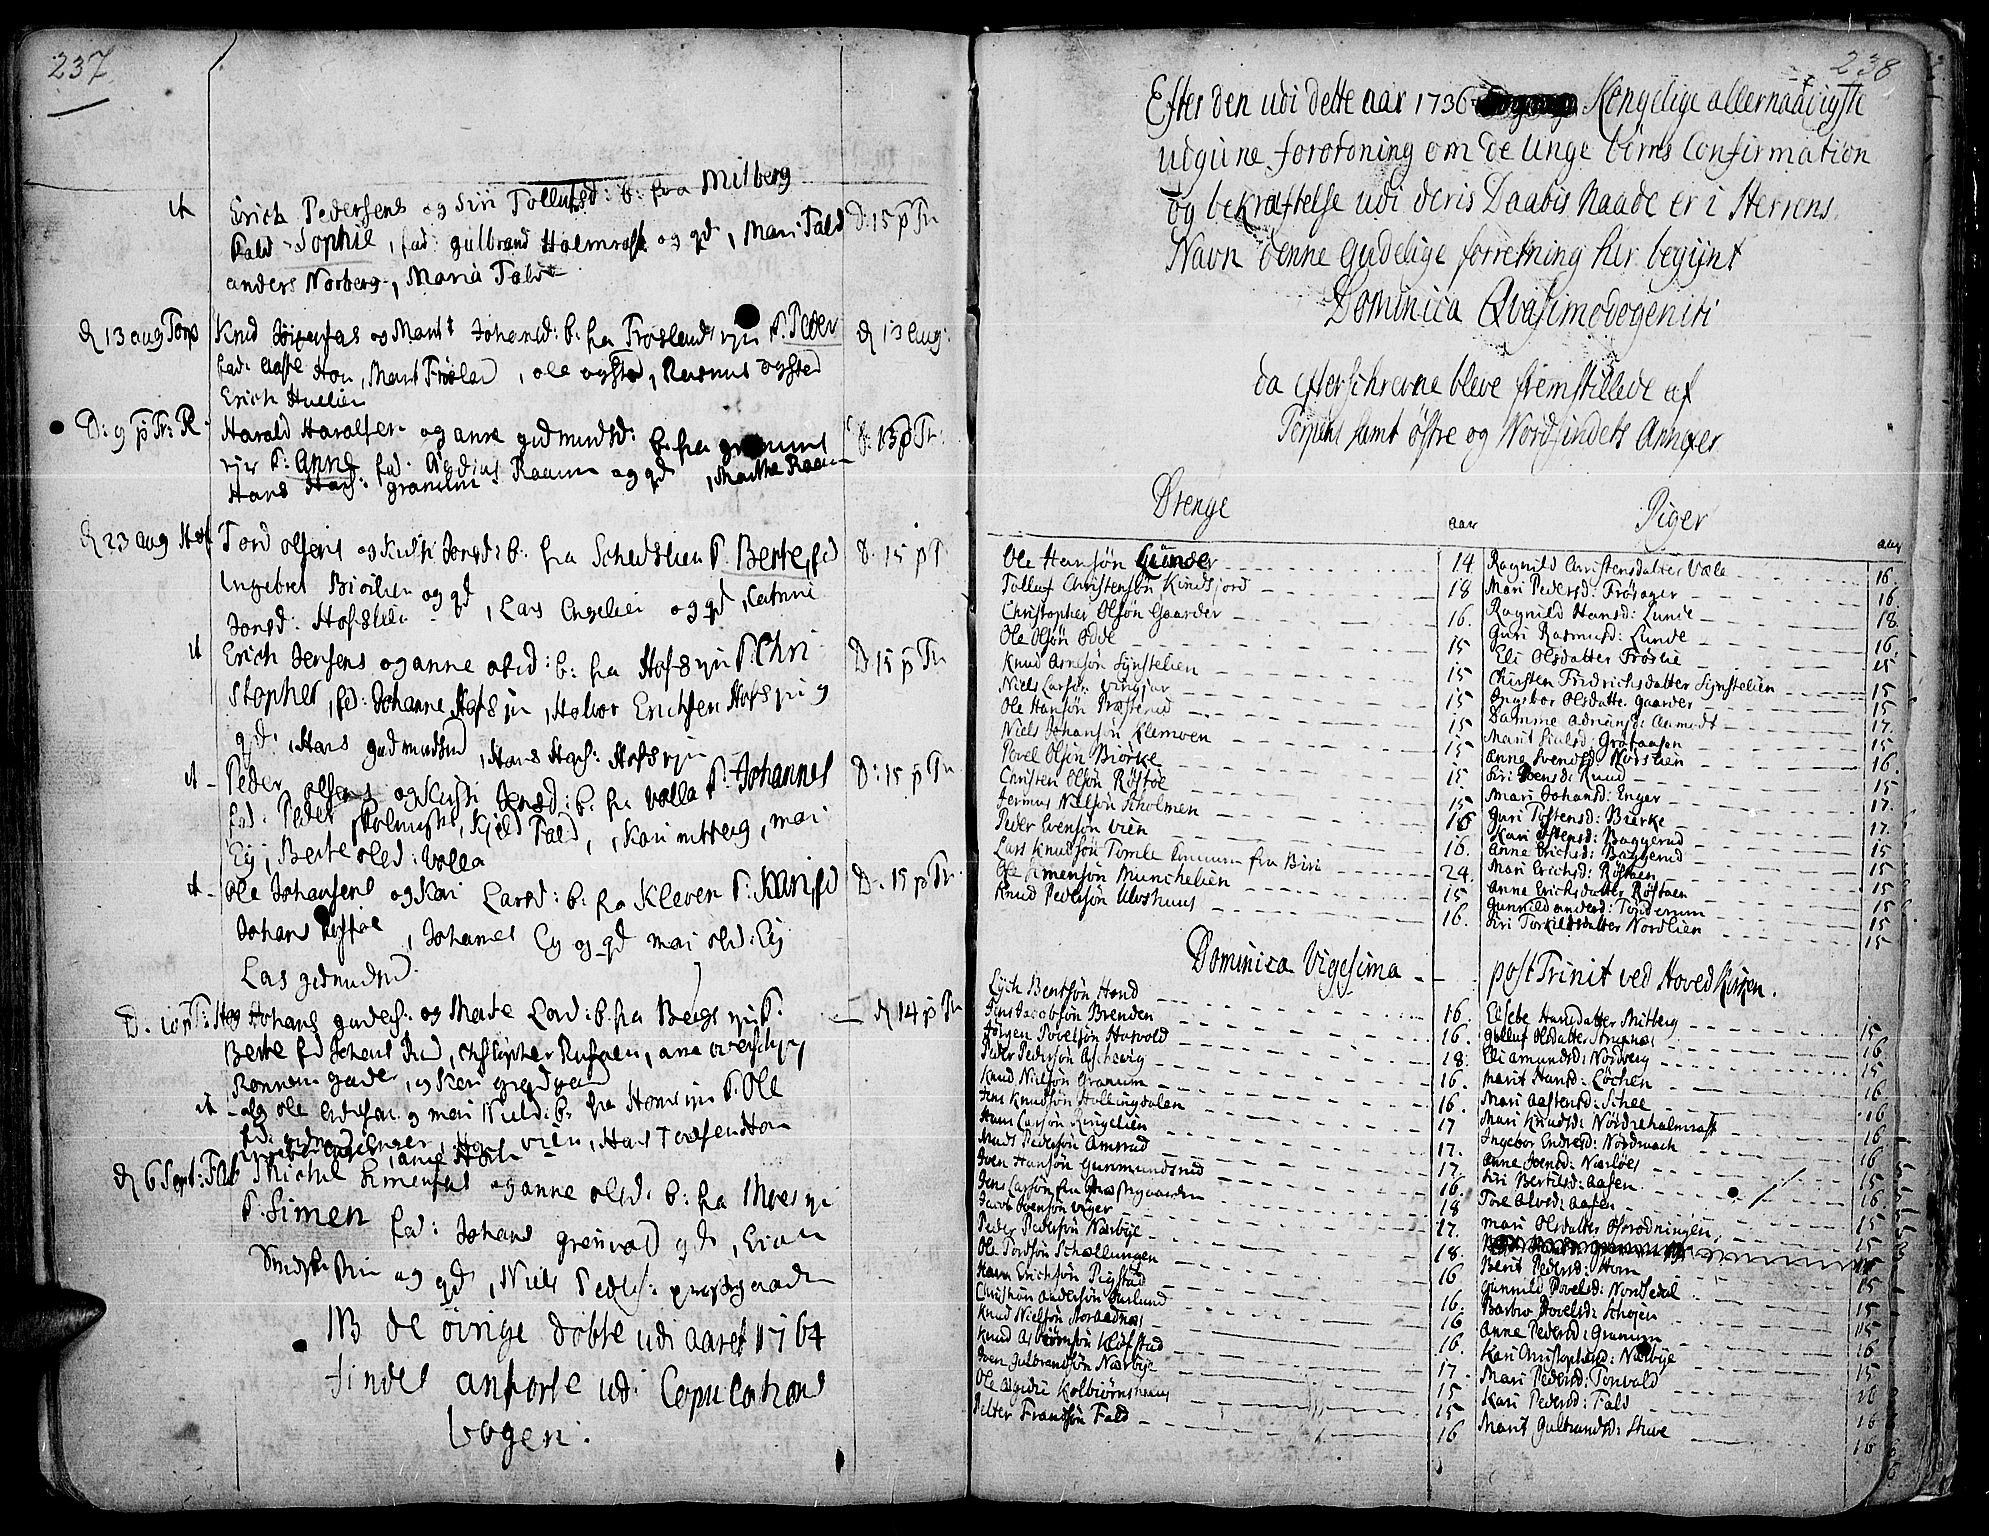 SAH, Land prestekontor, Ministerialbok nr. 2, 1733-1764, s. 237-238